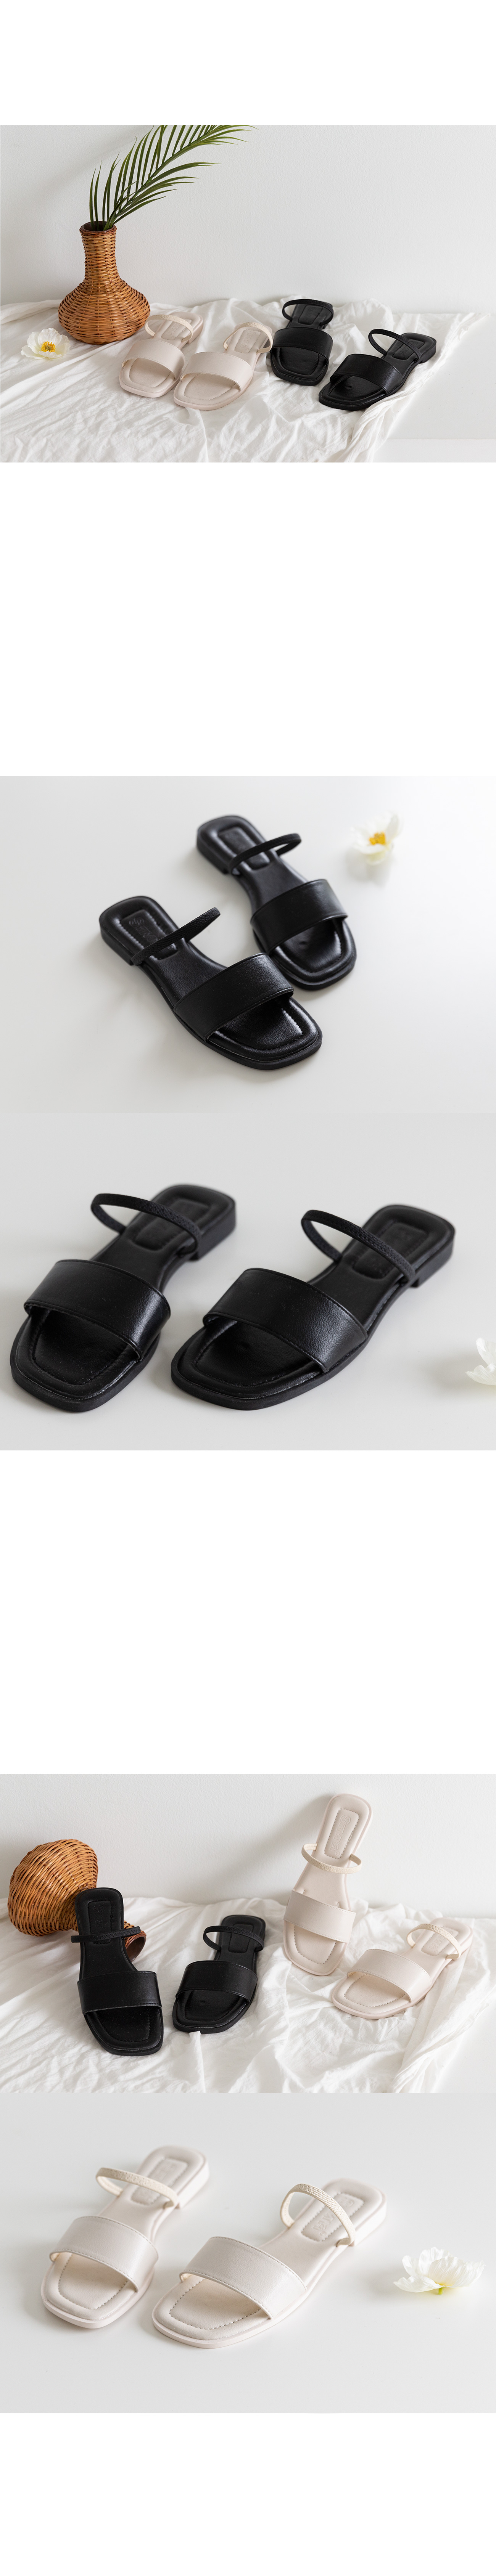 Strap Square Shoes #86238